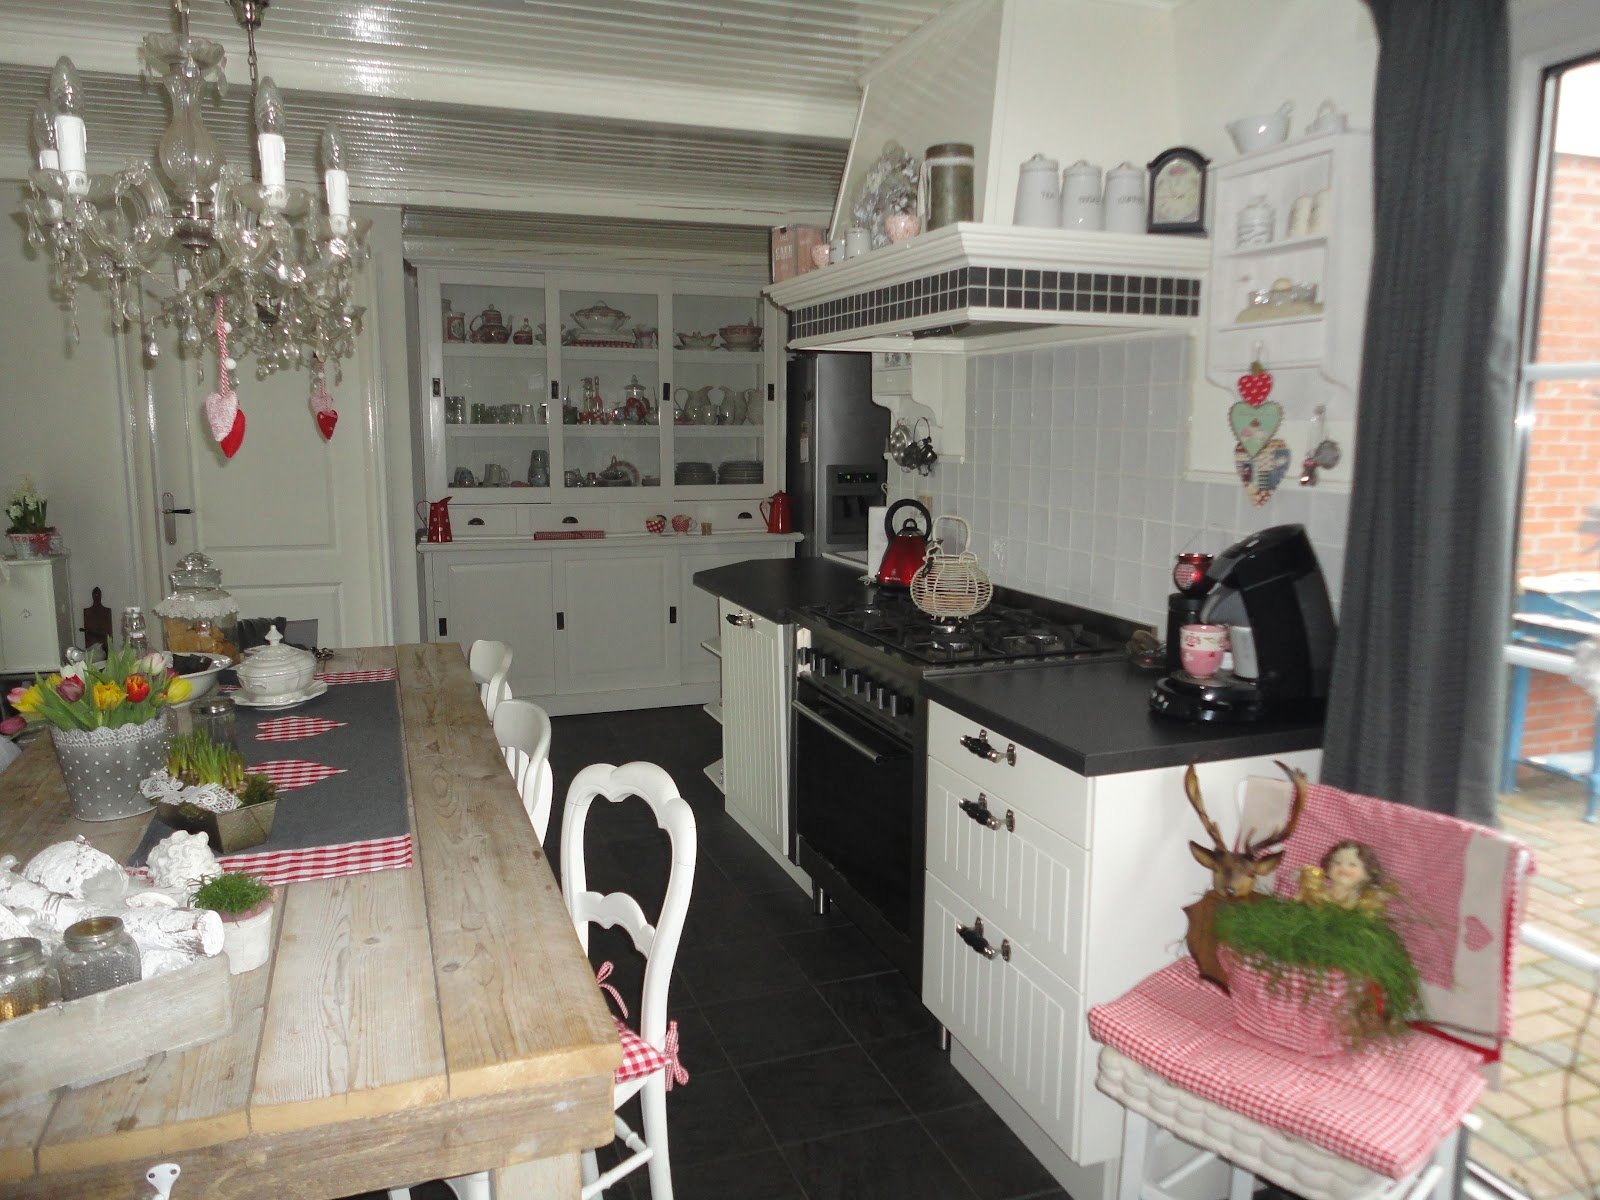 landelijke brocante keuken : Lovely Brocante Fleur En Kleur Op Woensdag